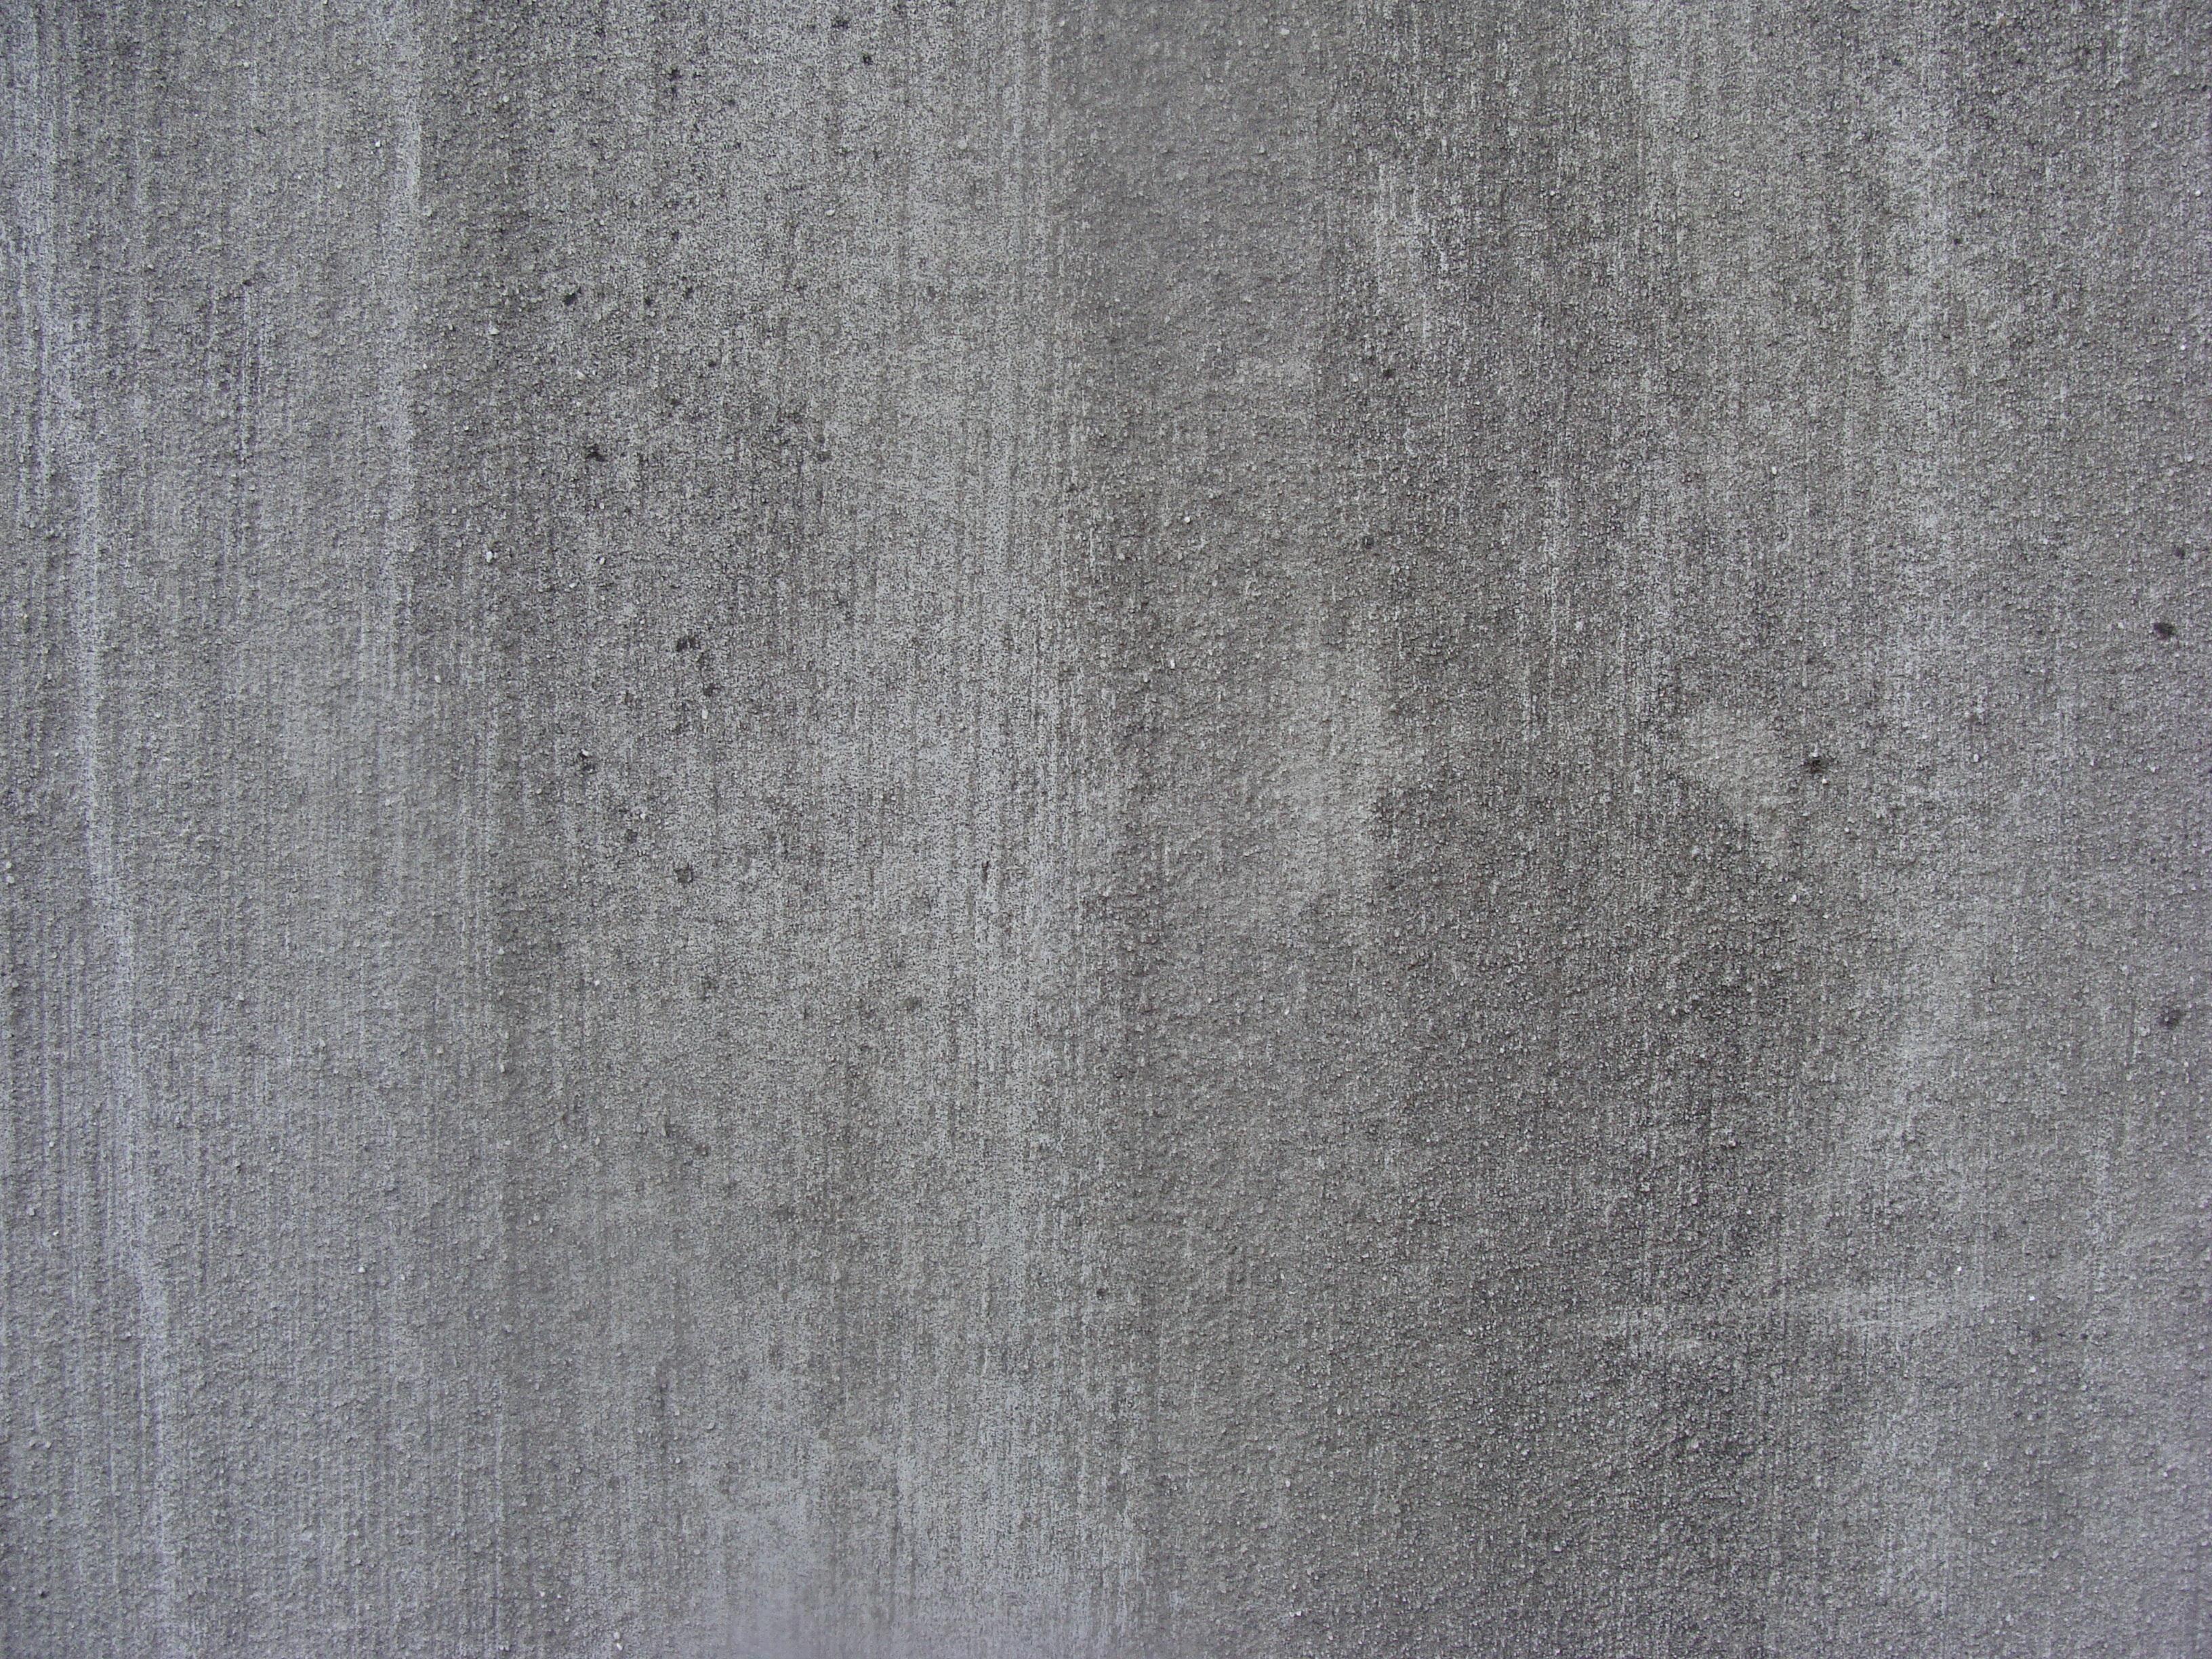 Black Grey Wood Flooring Free Images Texture Floor Wall